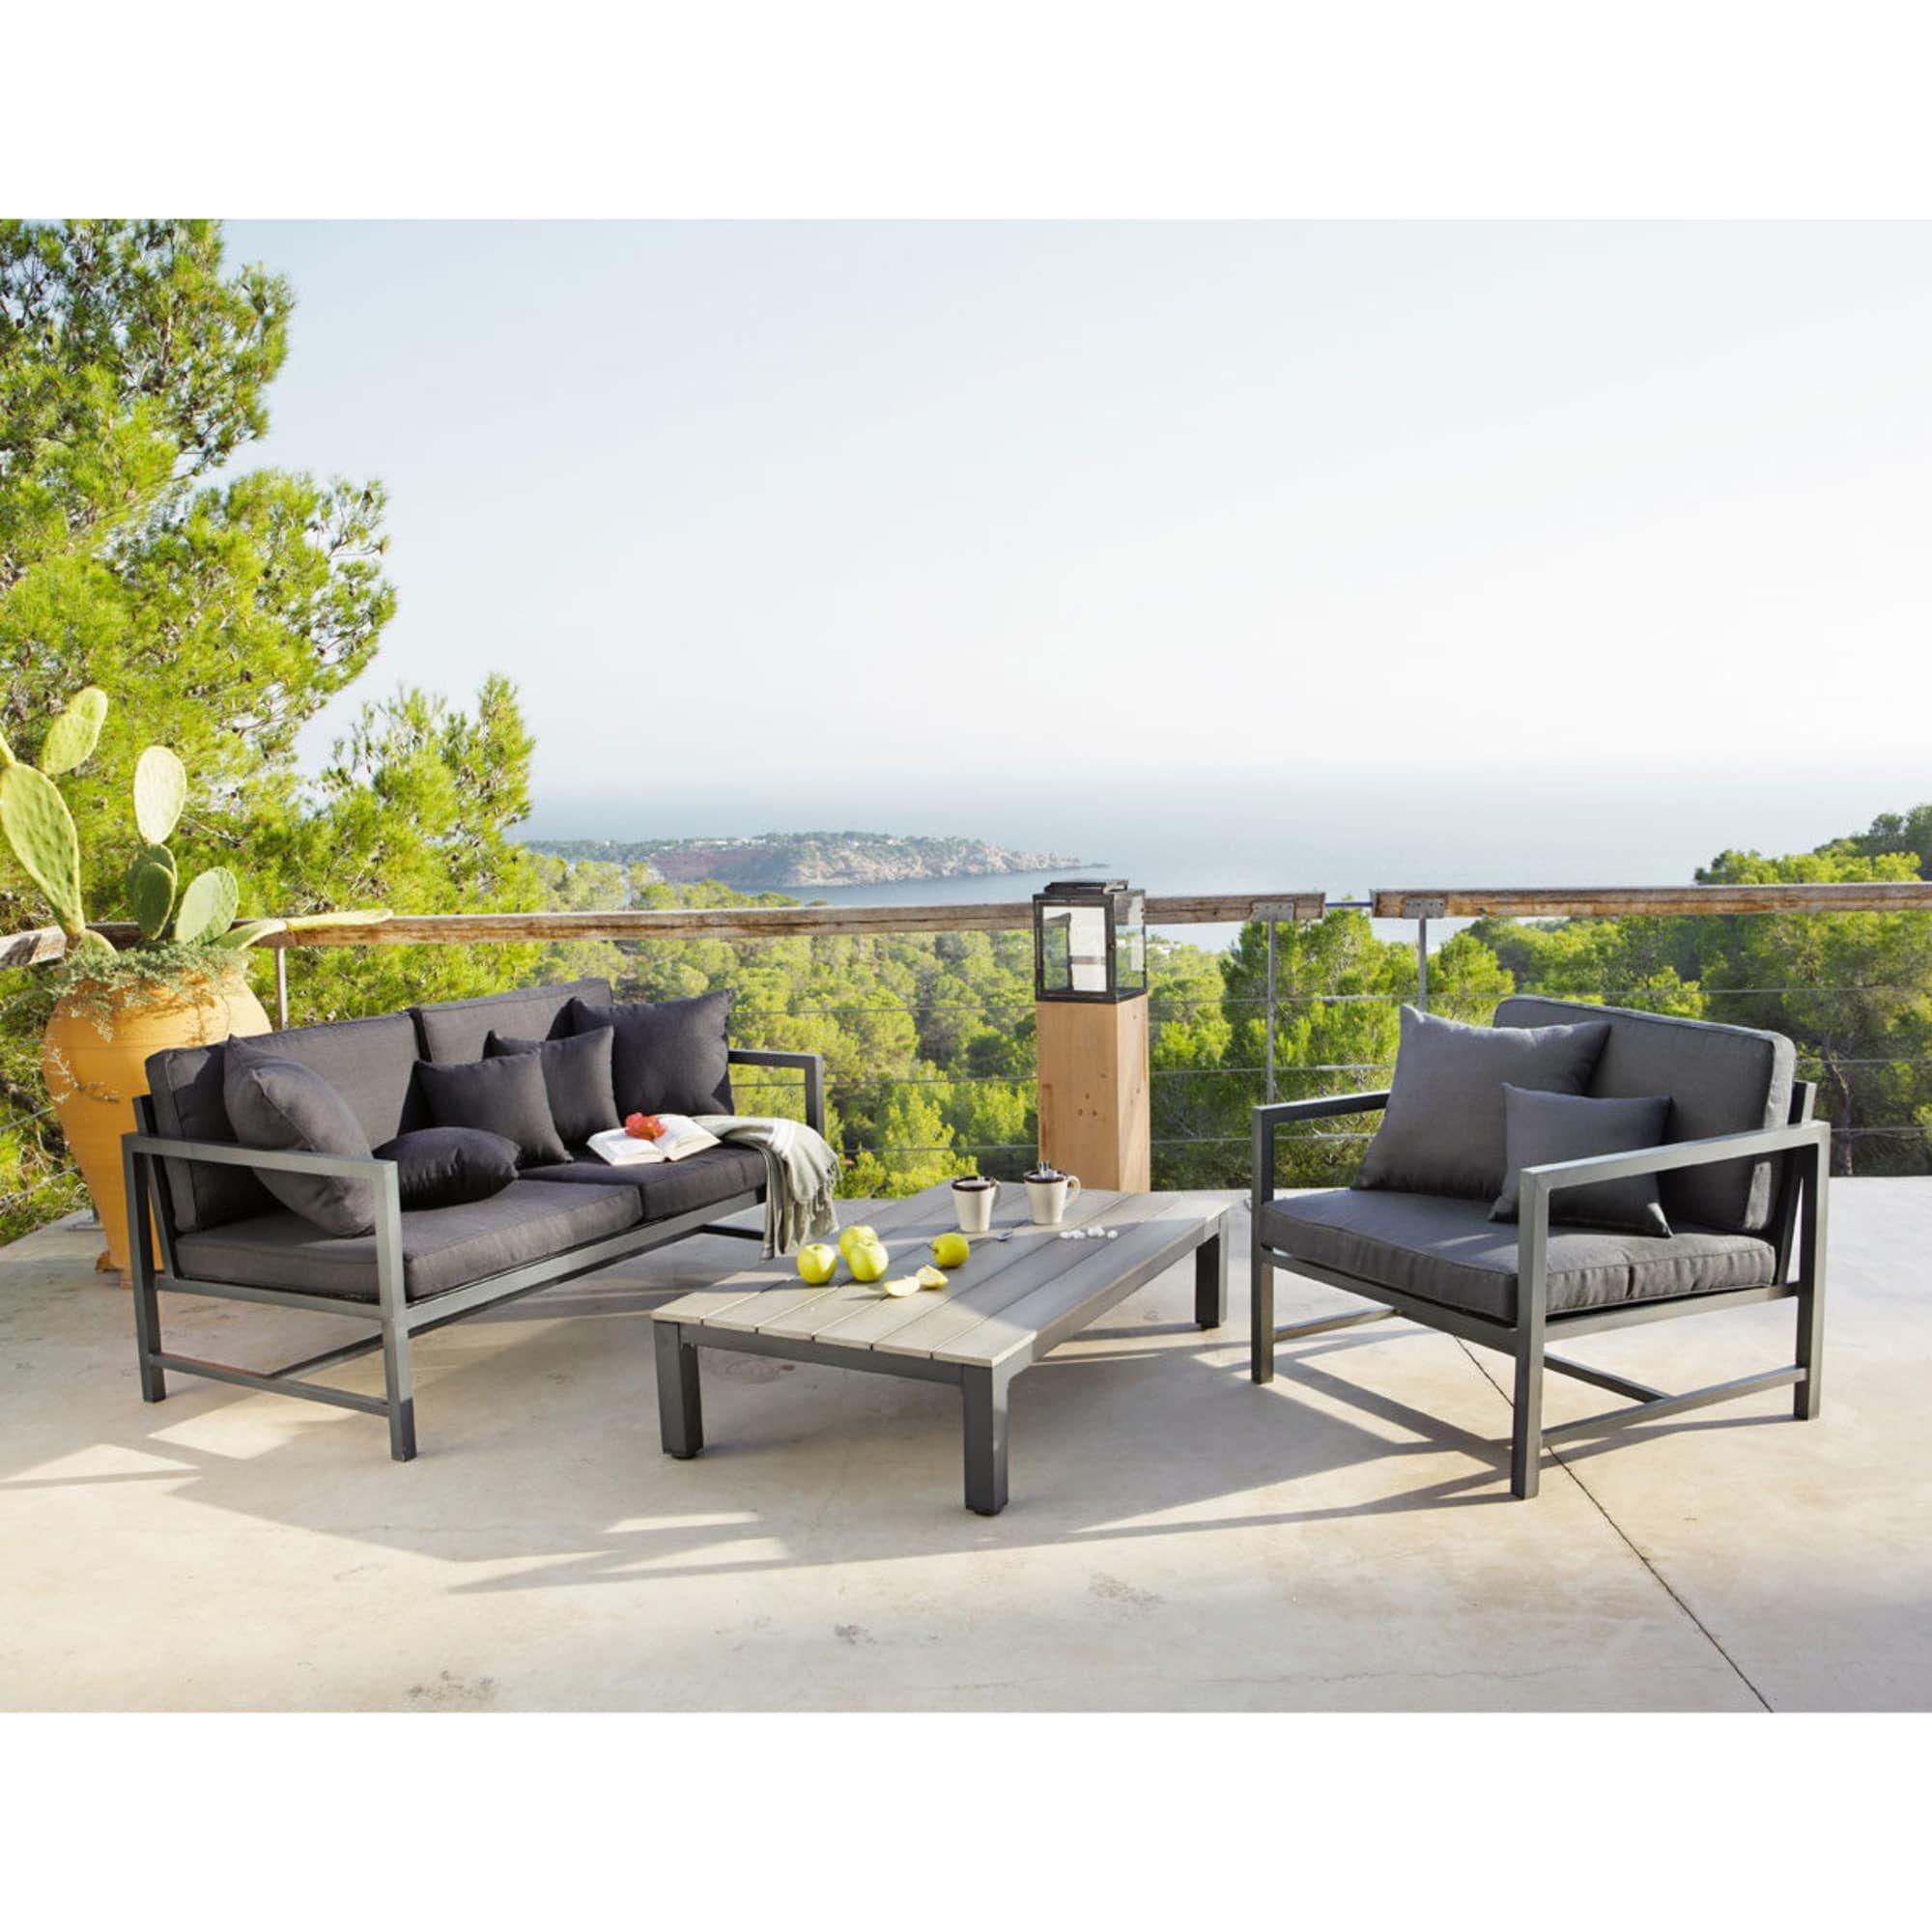 Outdoor Furniture In 2019 Outdoor Furniture Sets Garden Coffee